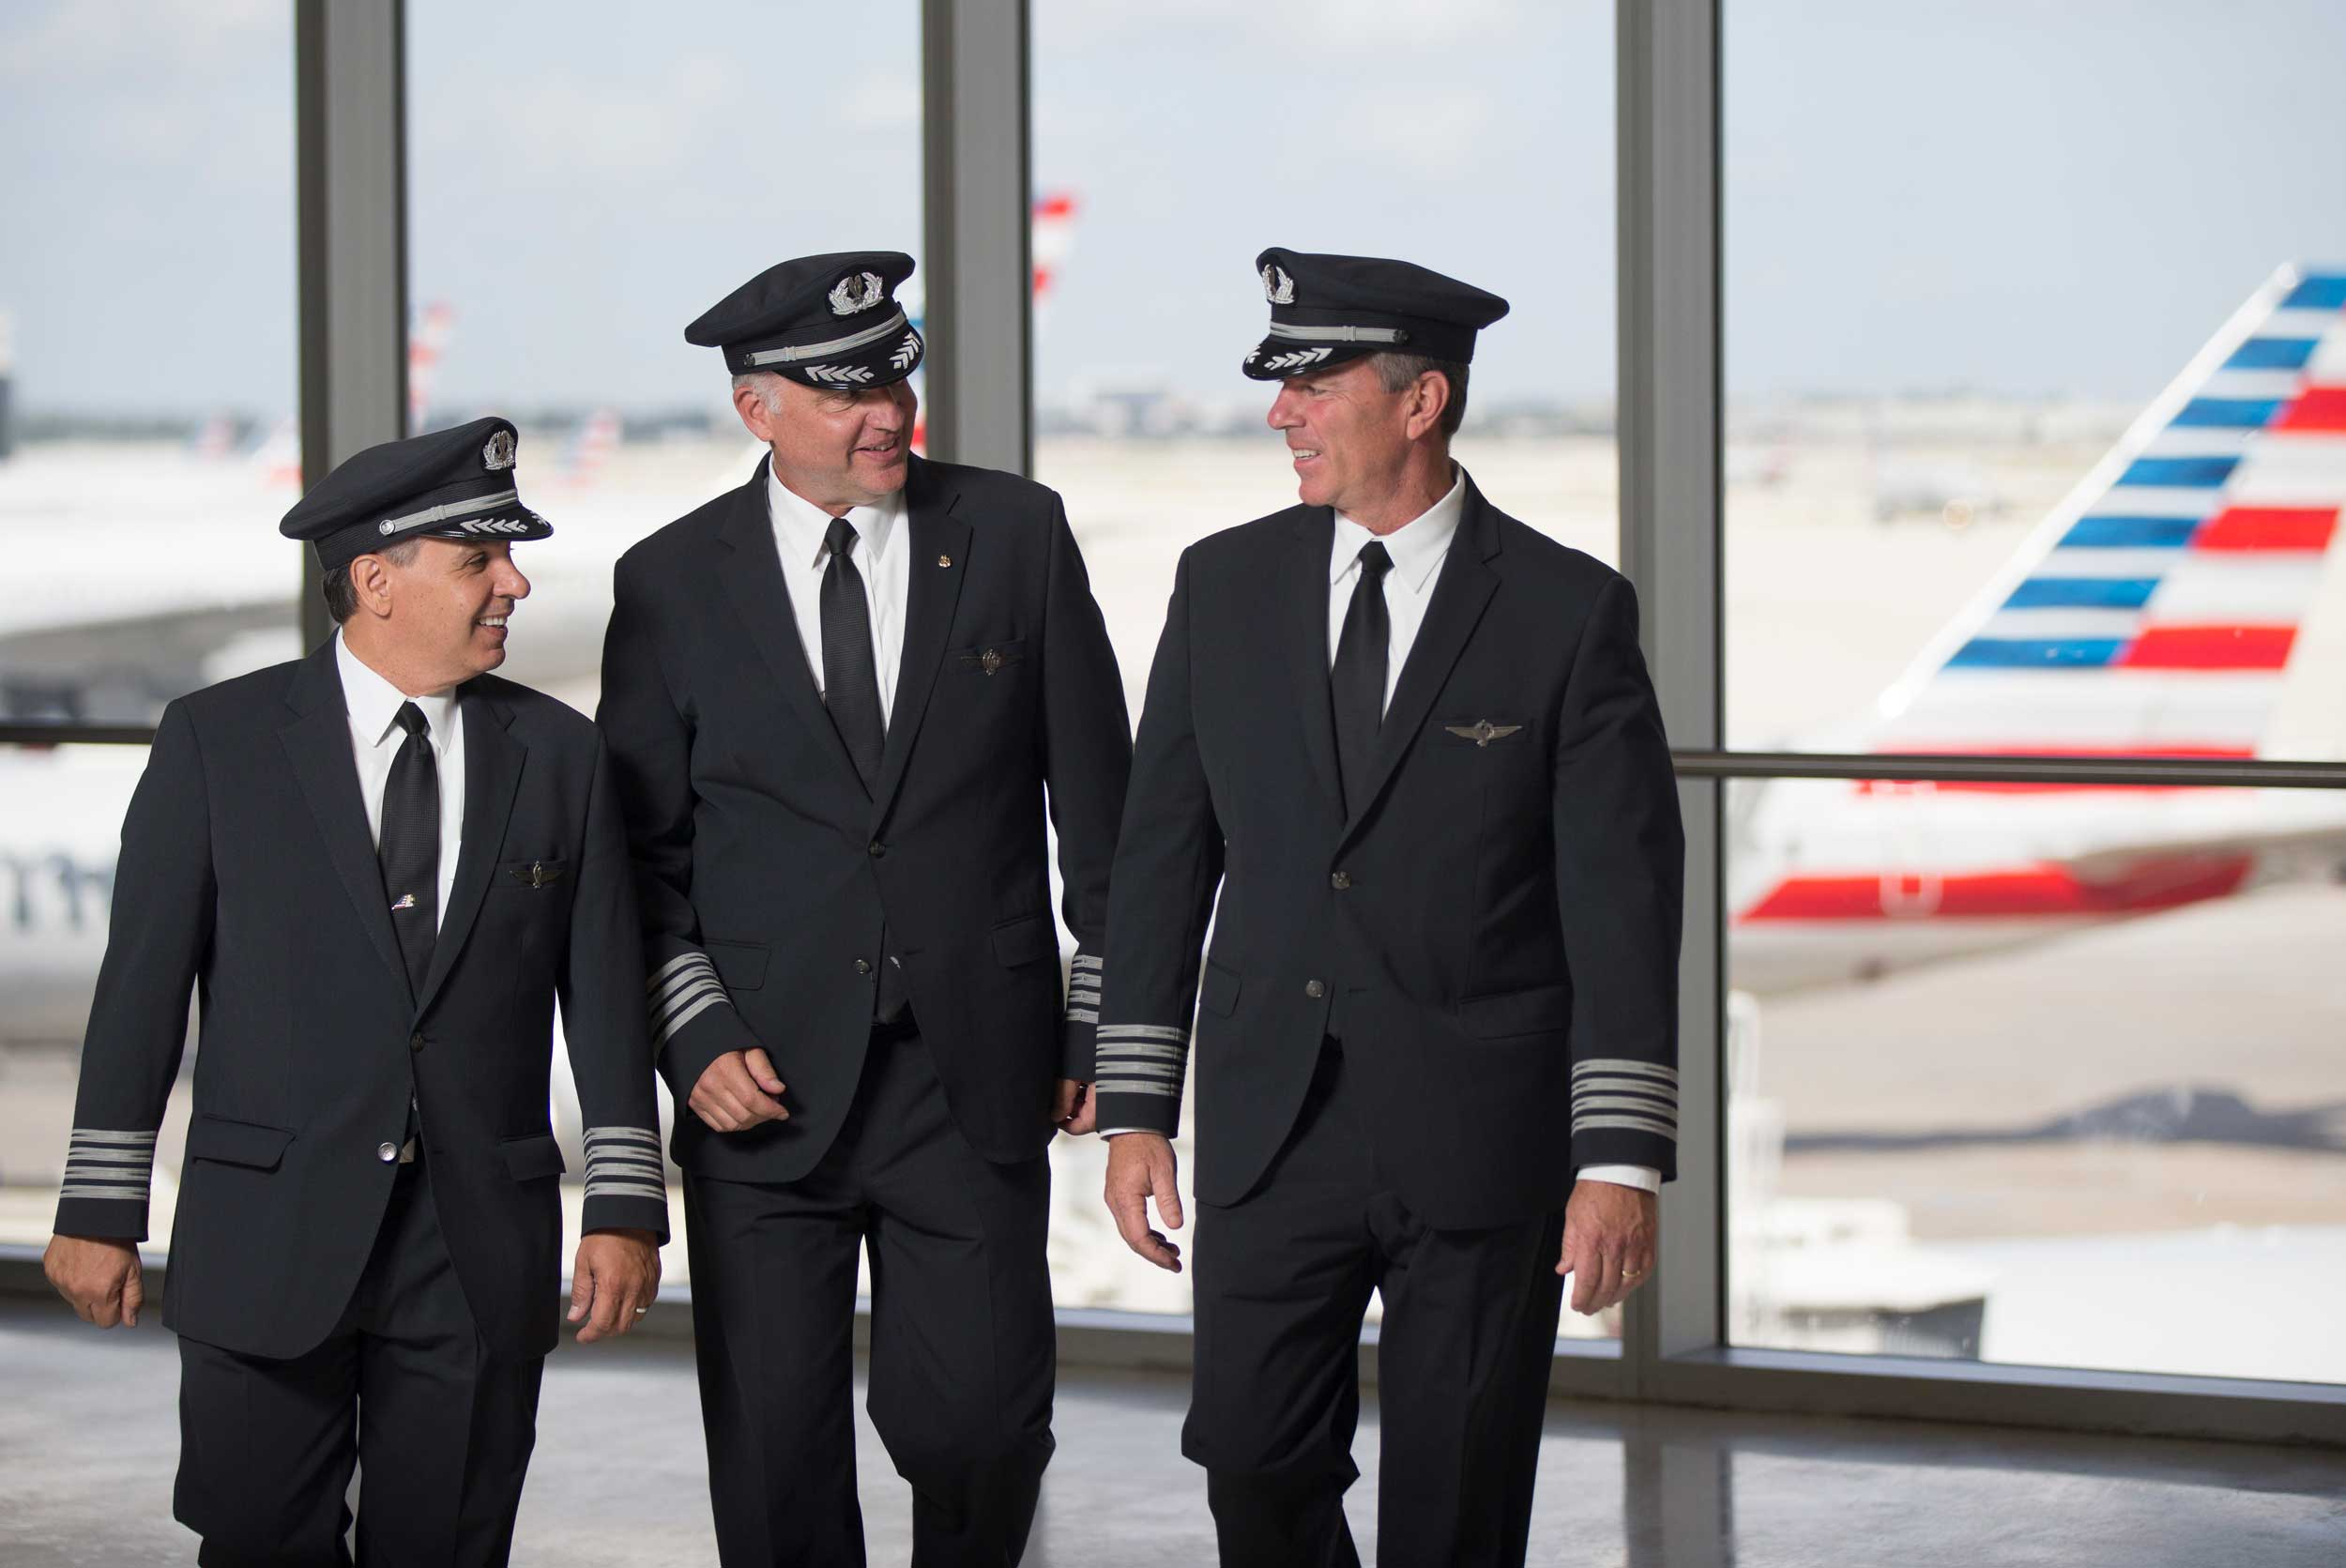 American Airlines pilot